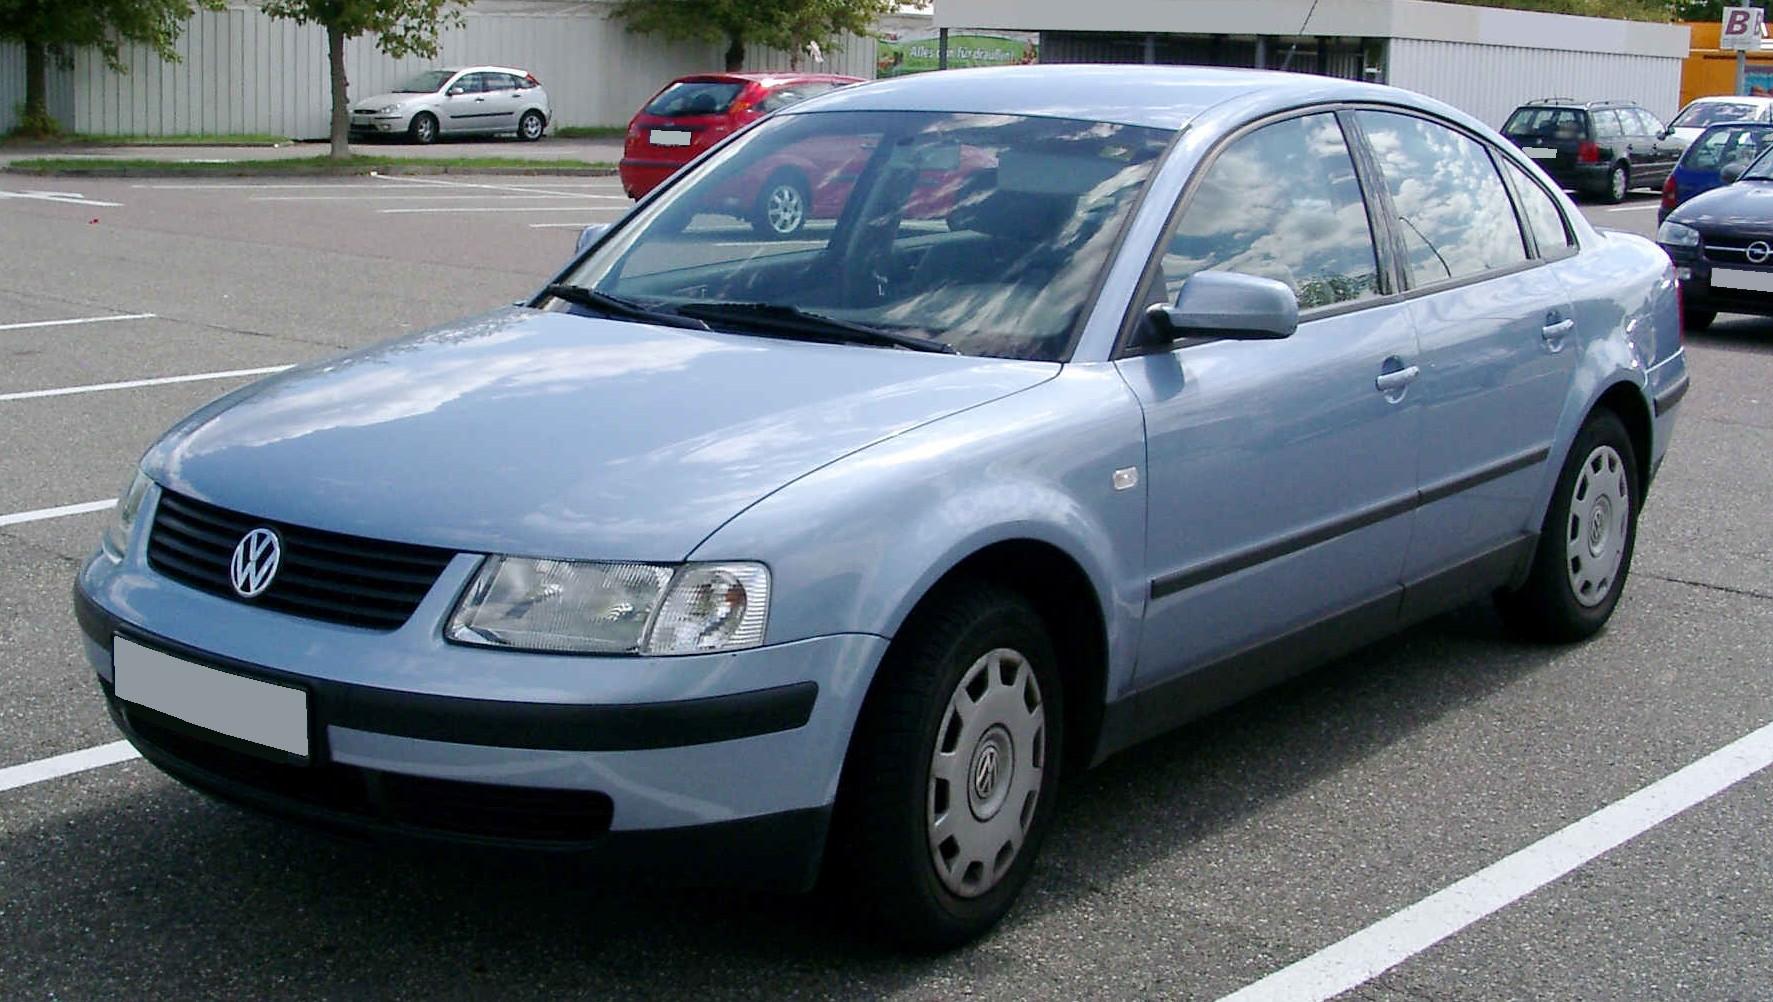 VW_Passat_B5